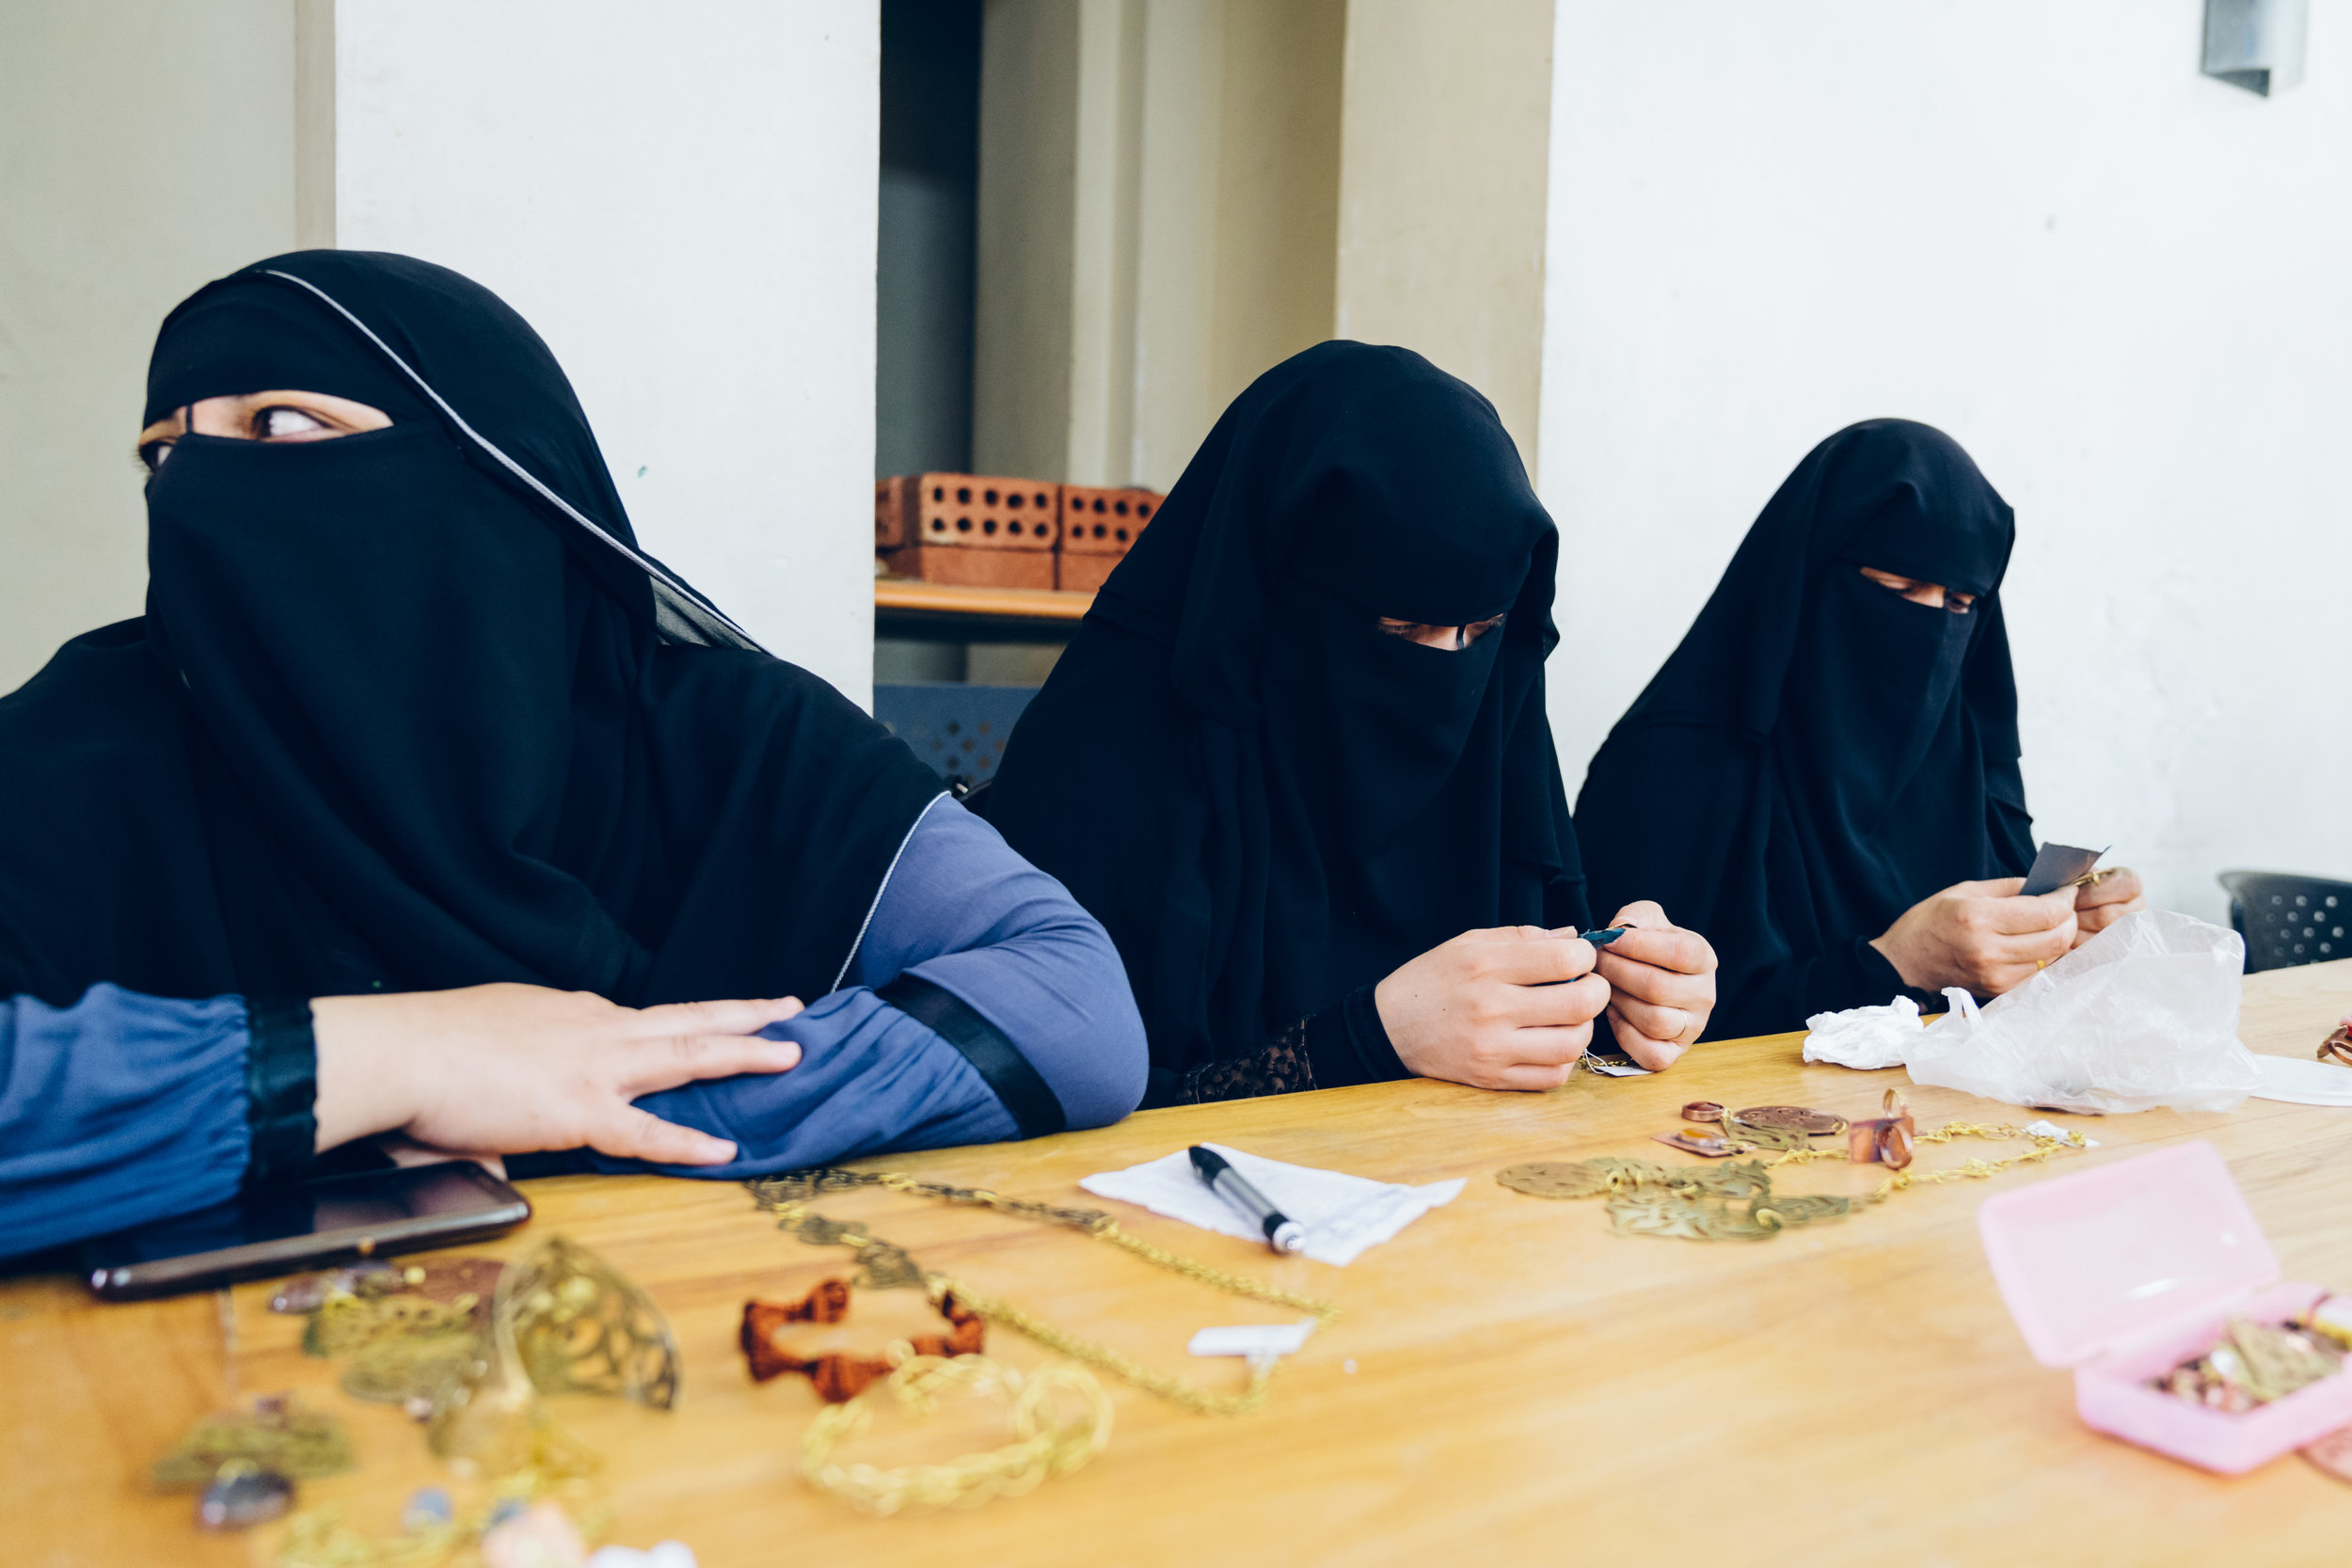 Women's jewellery training group